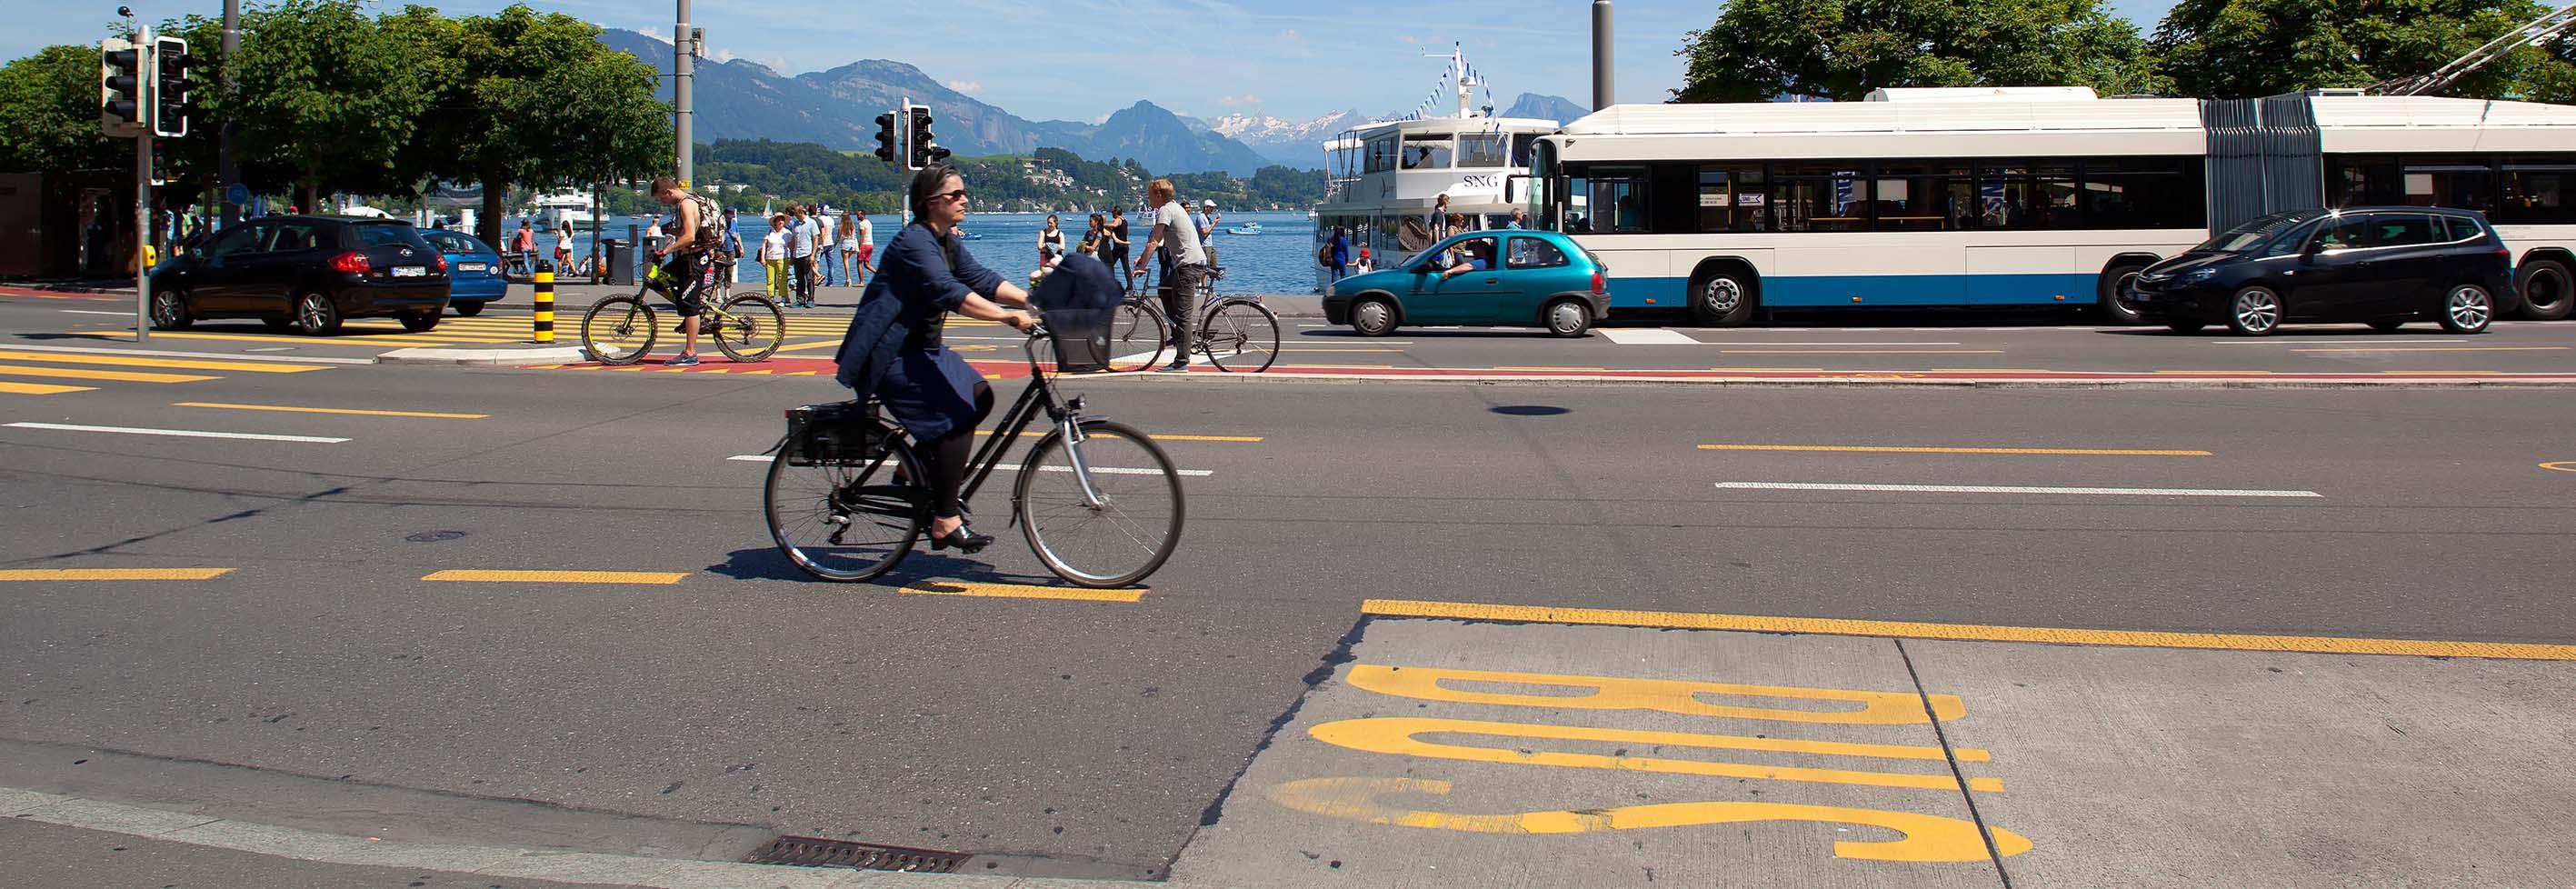 Mobilität & Parkierung